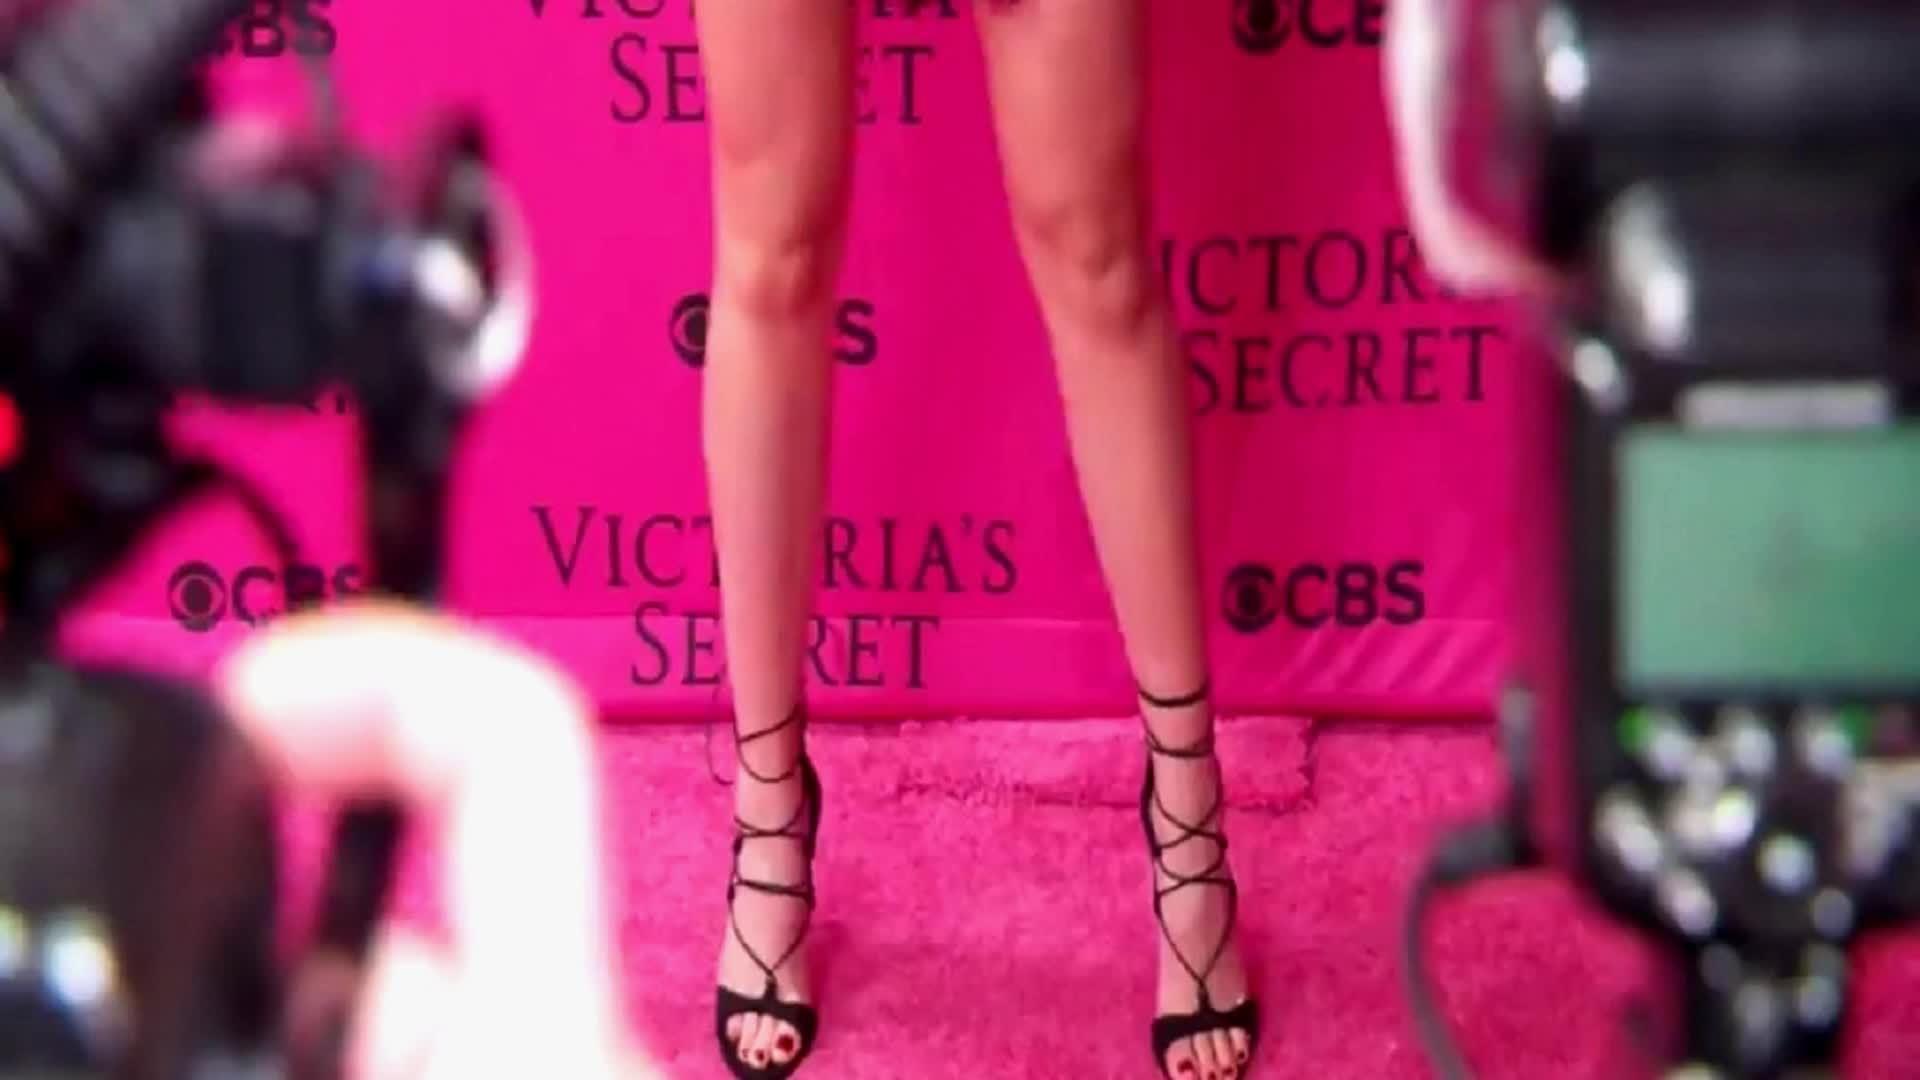 IrelandBaldwin, irelandbaldwin, Ireland Baldwin ~ Victoria's Secret Fashion Show After Party [2015] GIFs